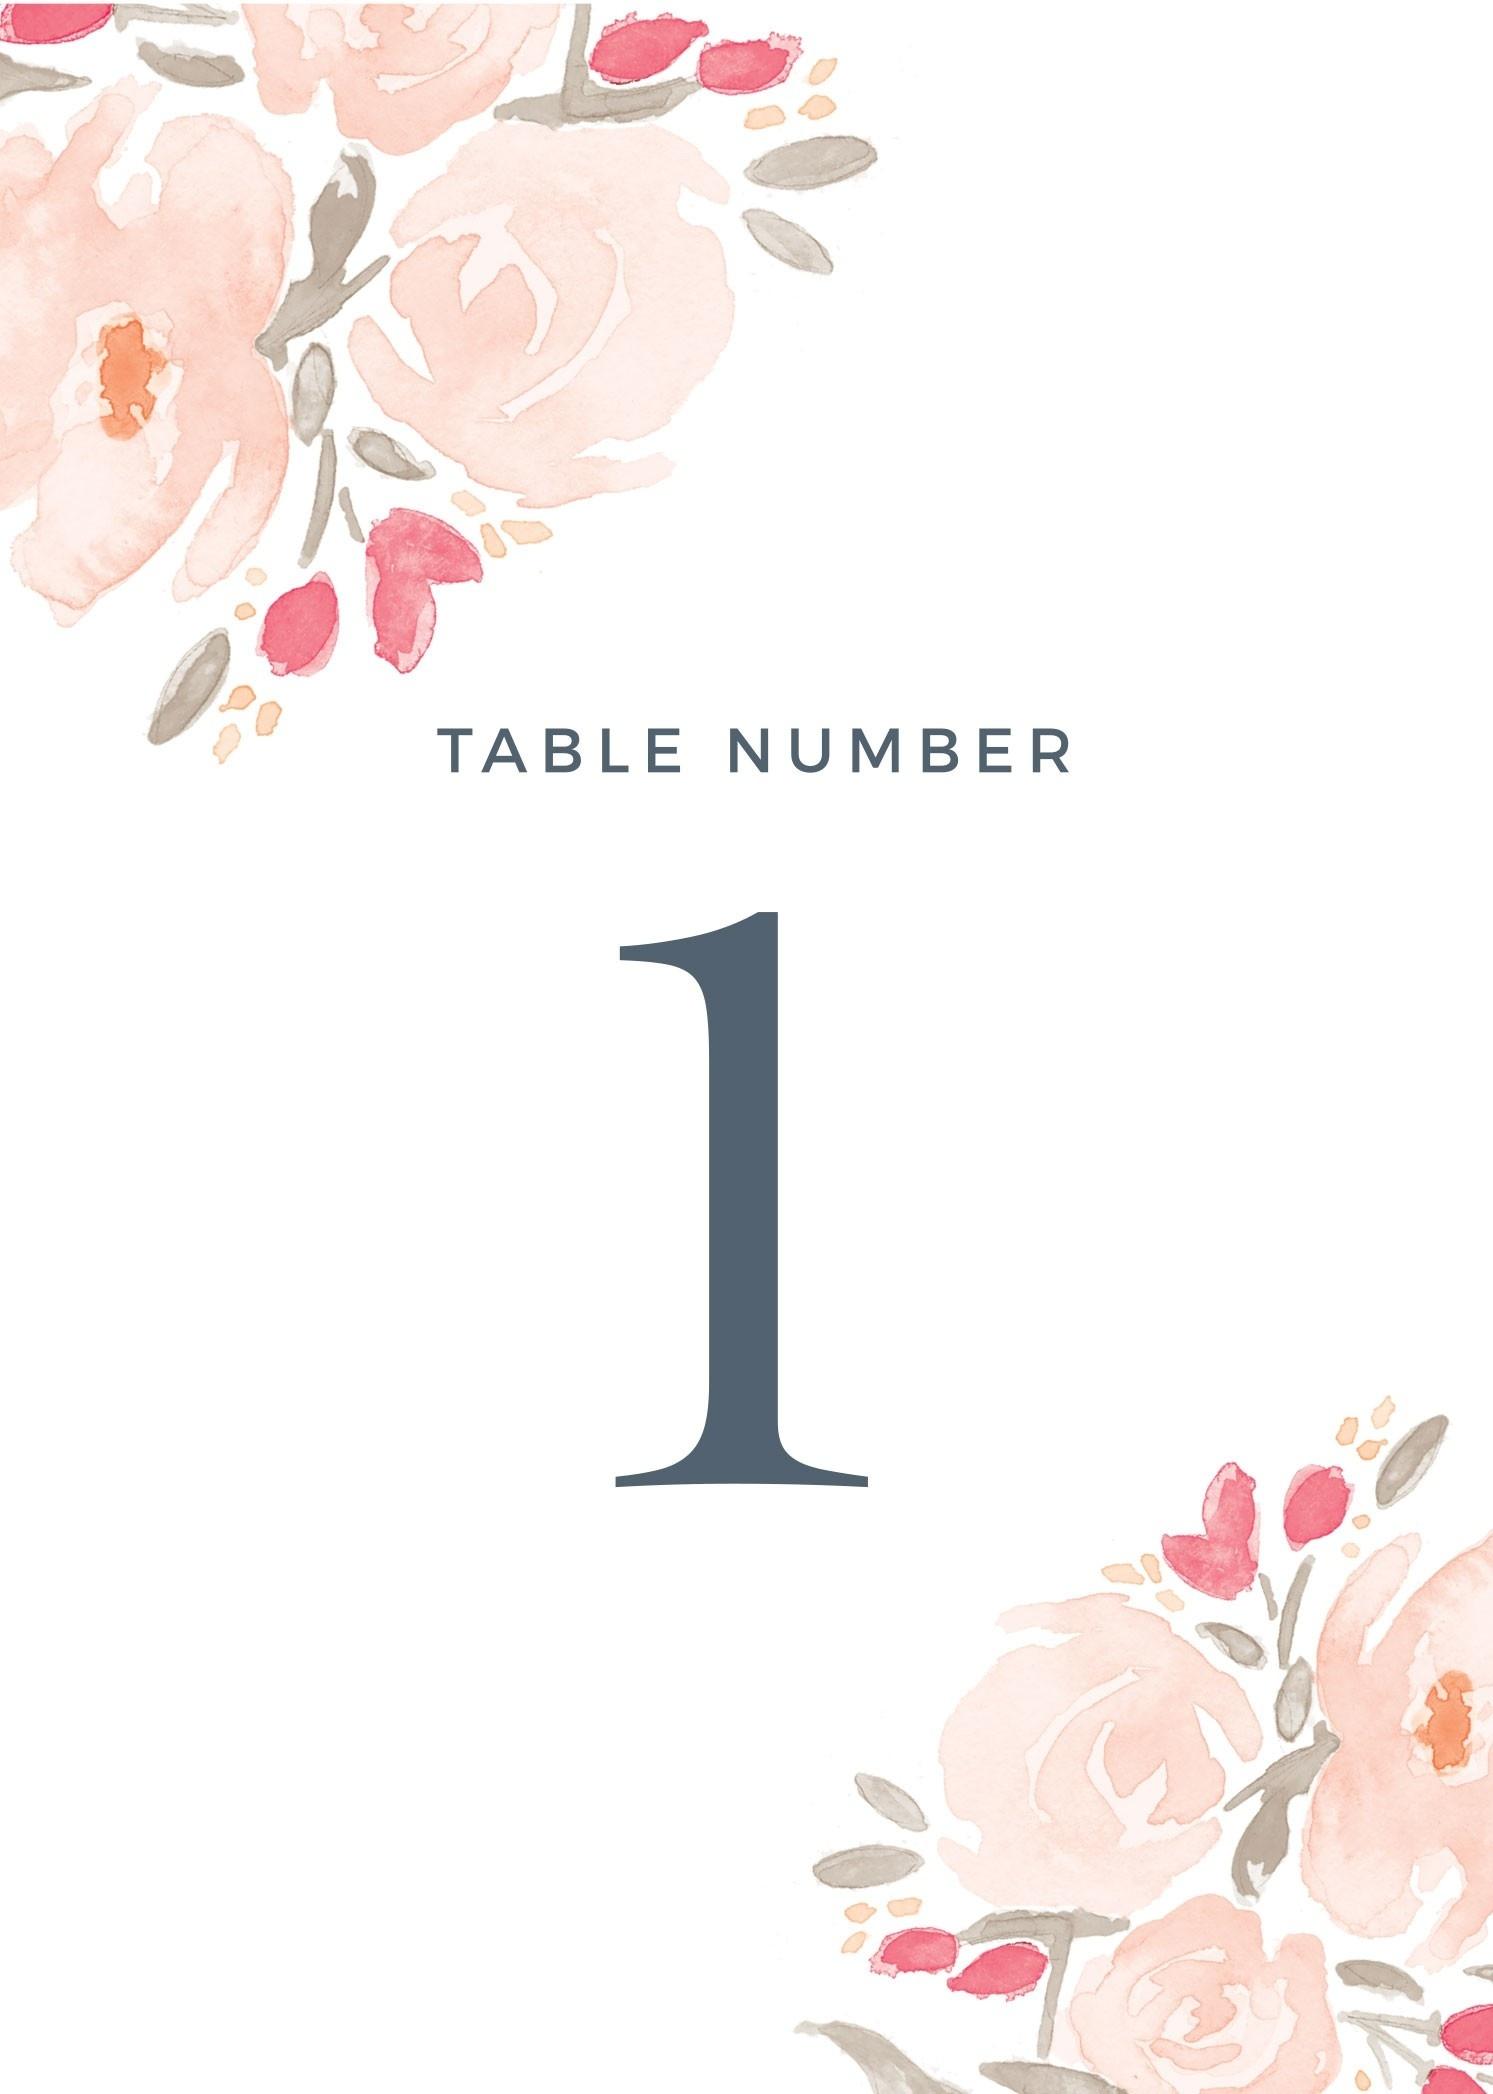 Wedding Table Numbers | Printable Pdfbasic Invite - Free Printable Table Numbers